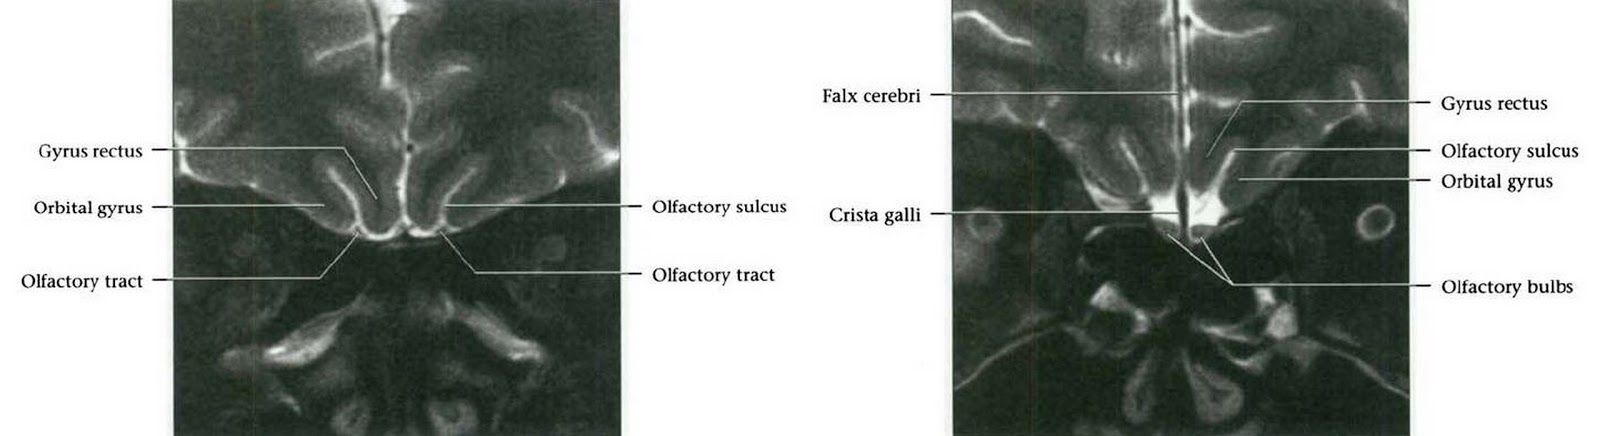 Dr Balaji Anvekar\'s Neuroradiology Cases: Cranial Nerves Normal MRI ...